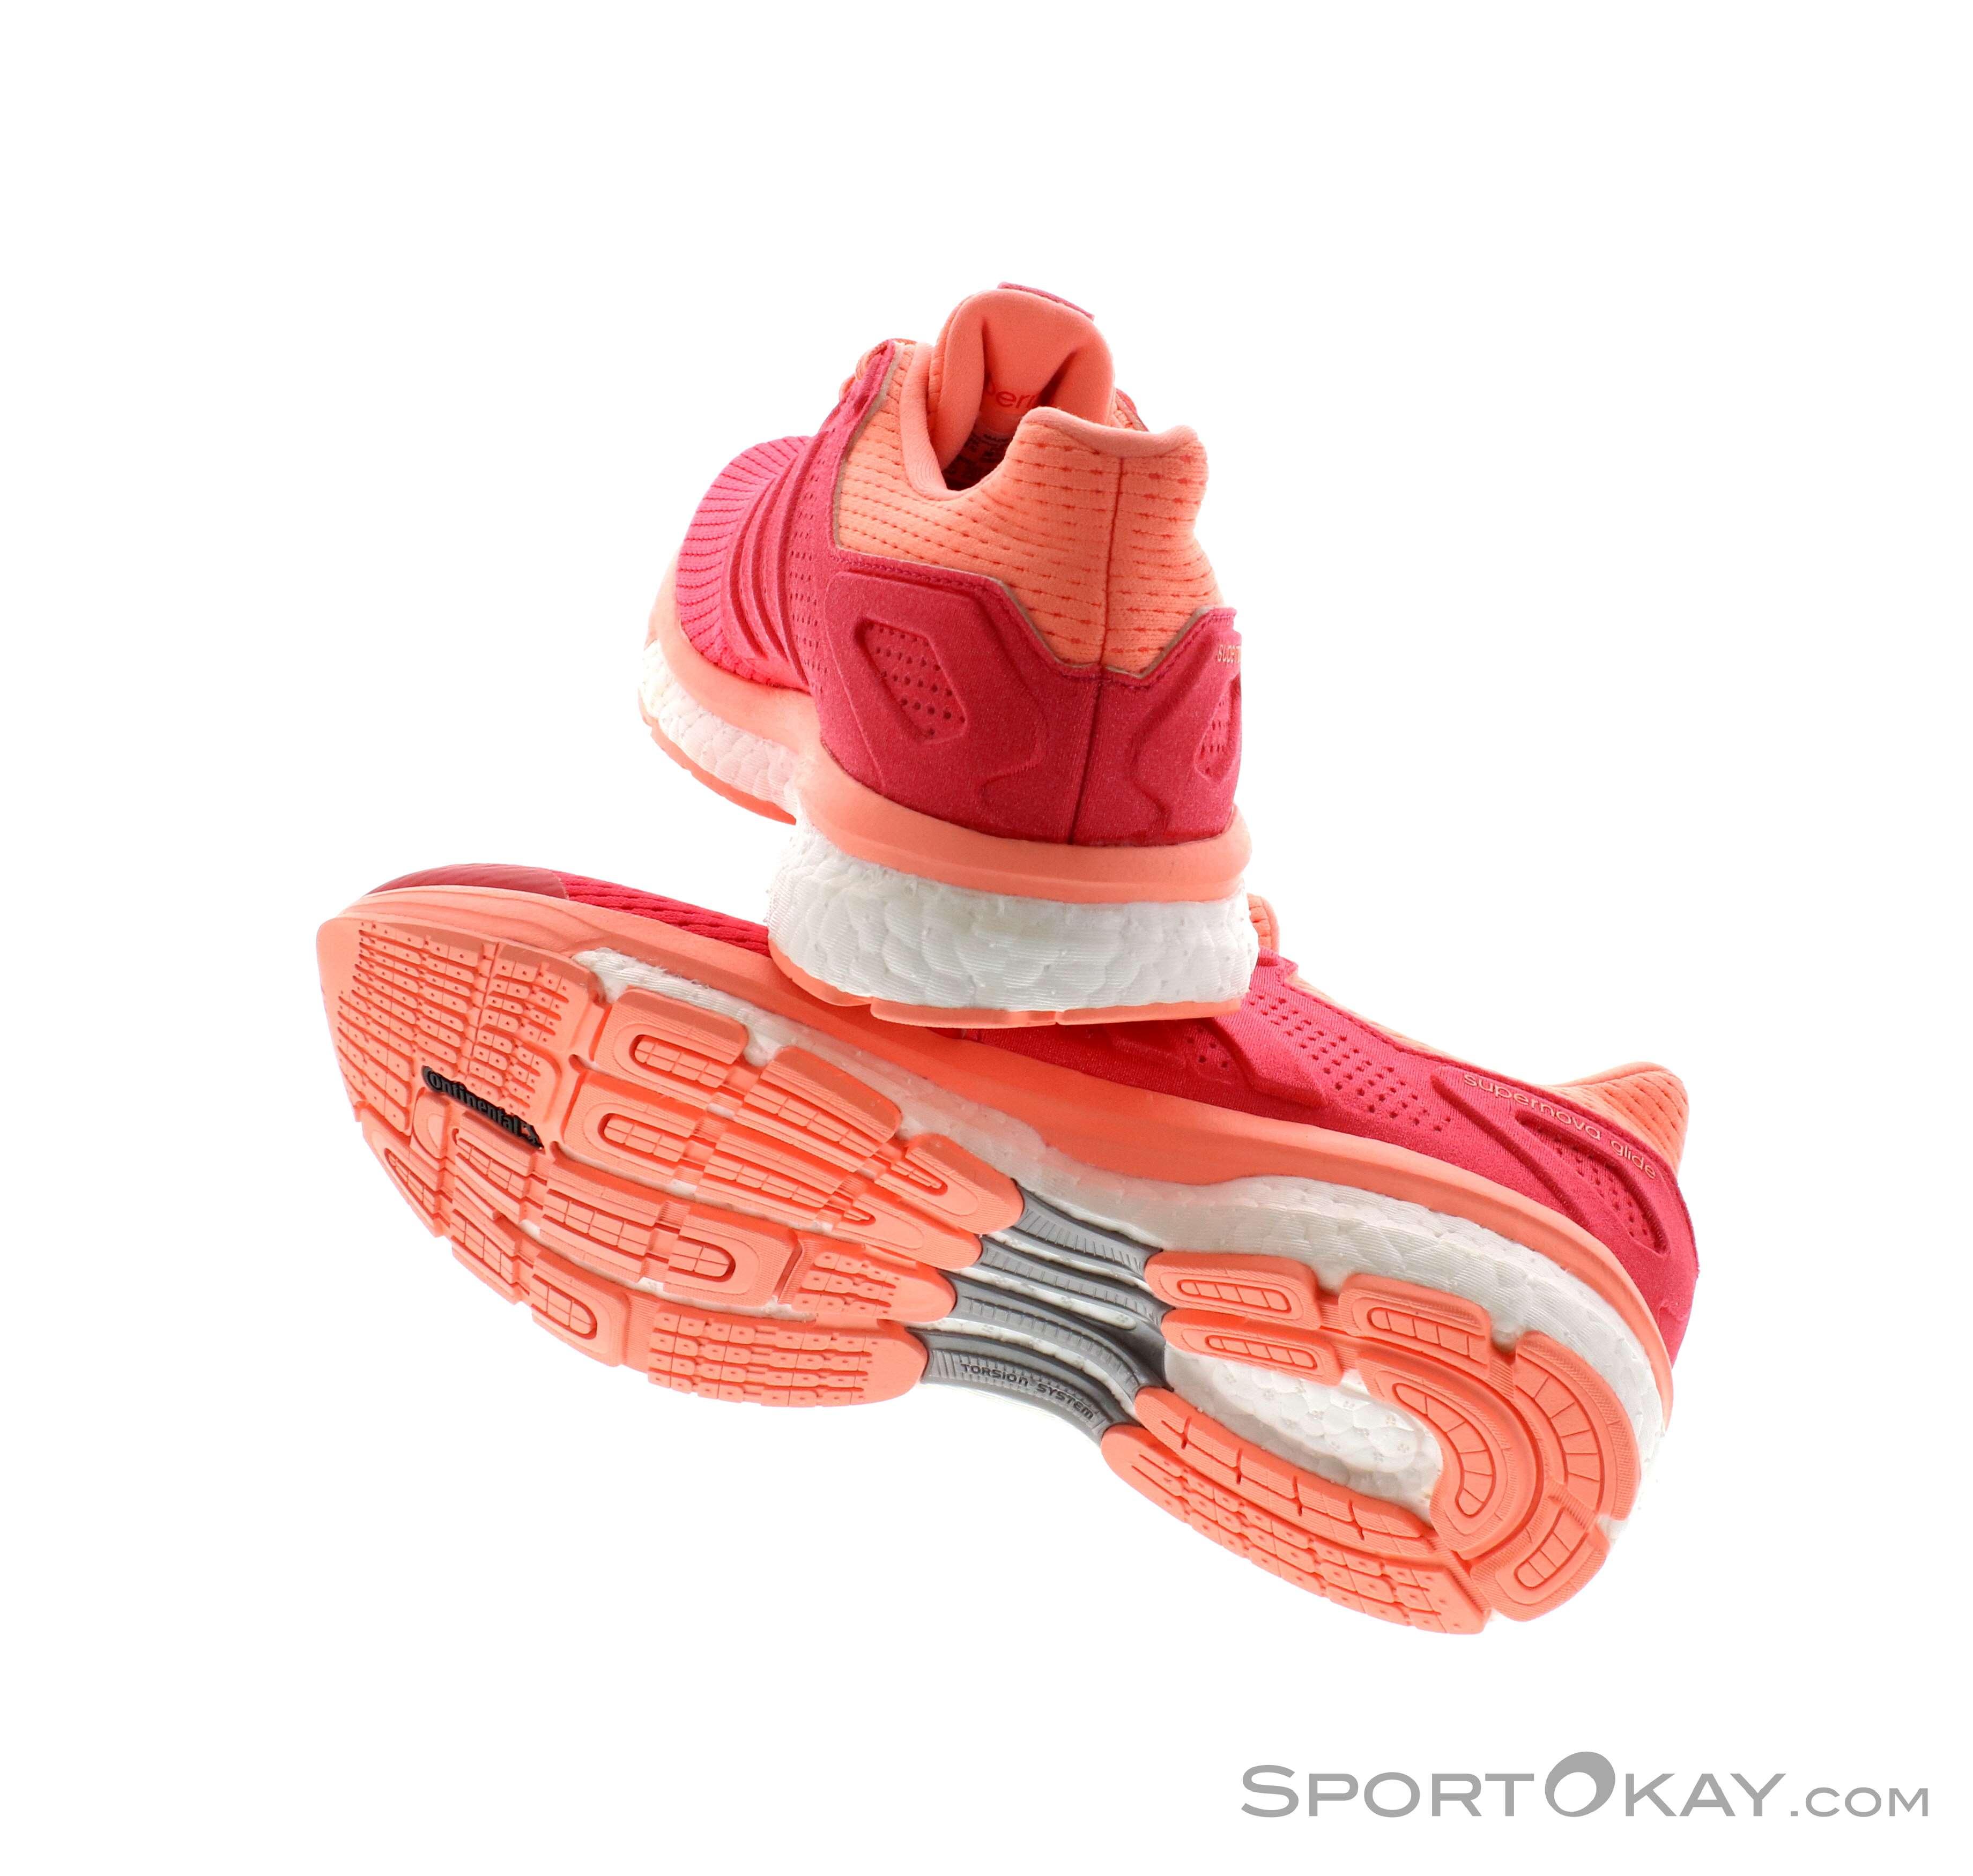 low priced 2098e 49446 adidas Supernova Glide Boost 8 W Damen Laufschuhe, adidas, Pink-Rosa, ,